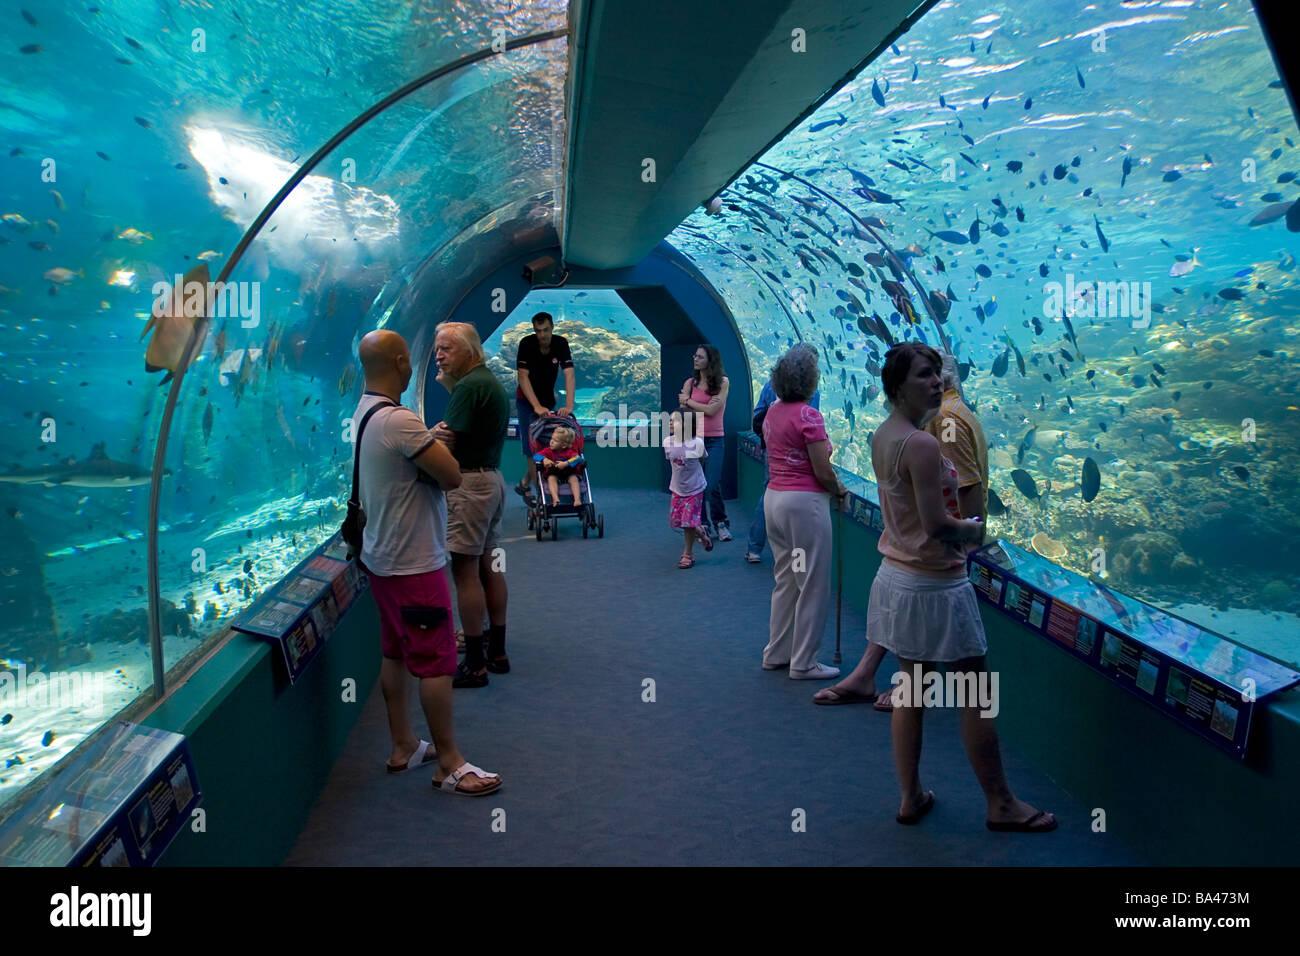 Fish tank queensland - Townsville Aquarium Queensland Australia Tunnel Walkthrough Stock Image